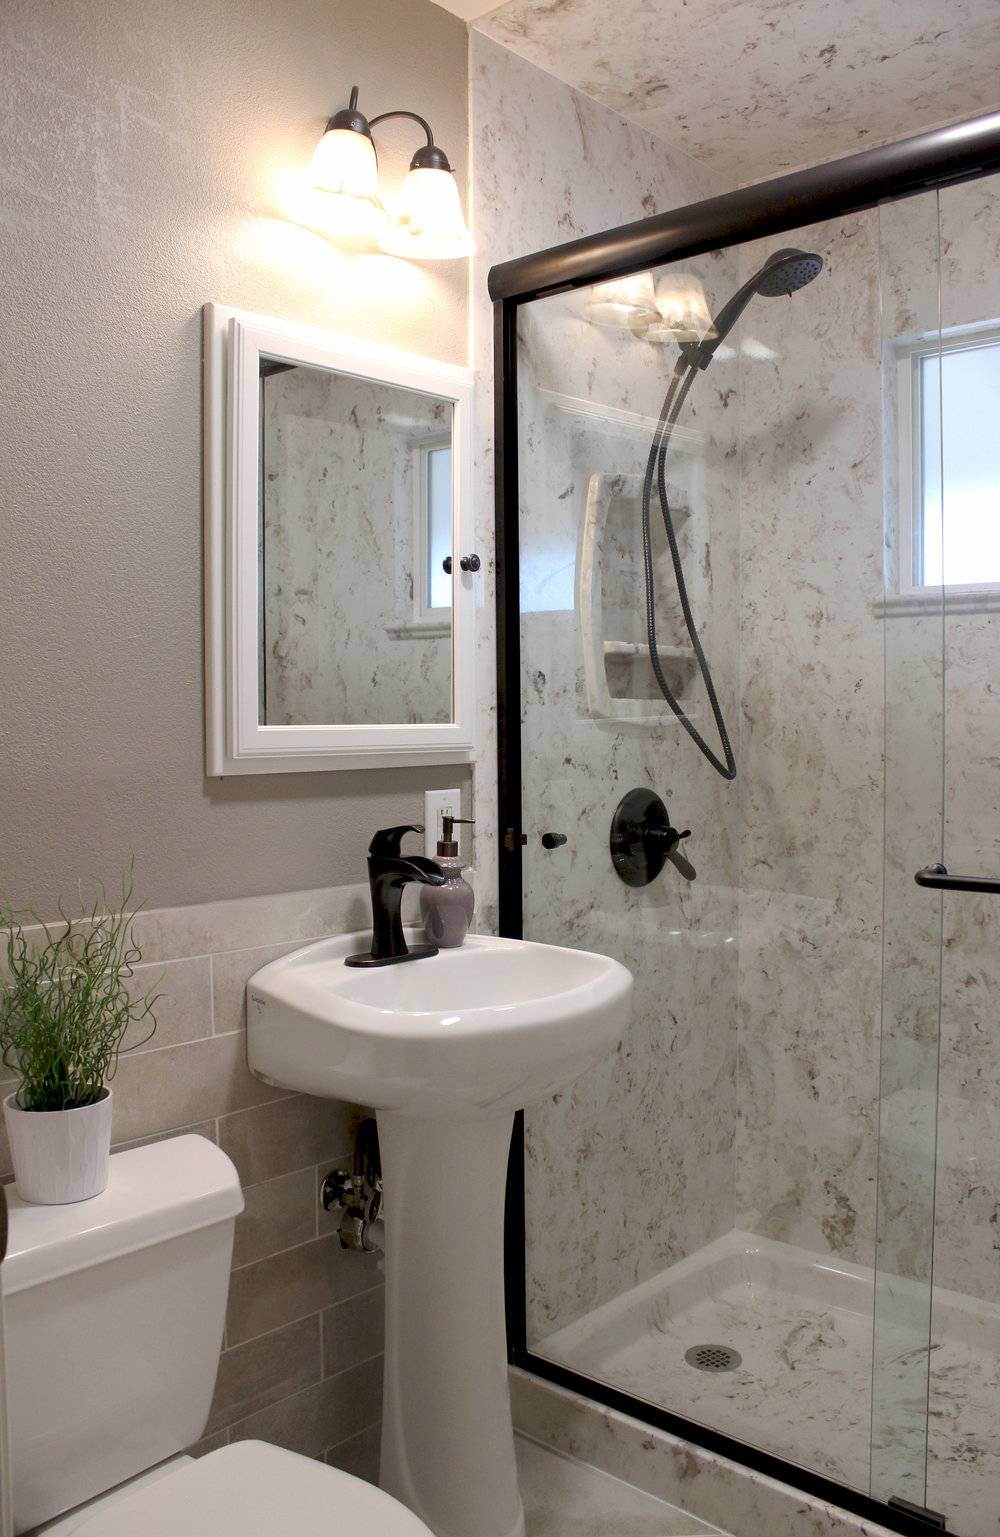 Bonito-full bath-from door 25.jpg